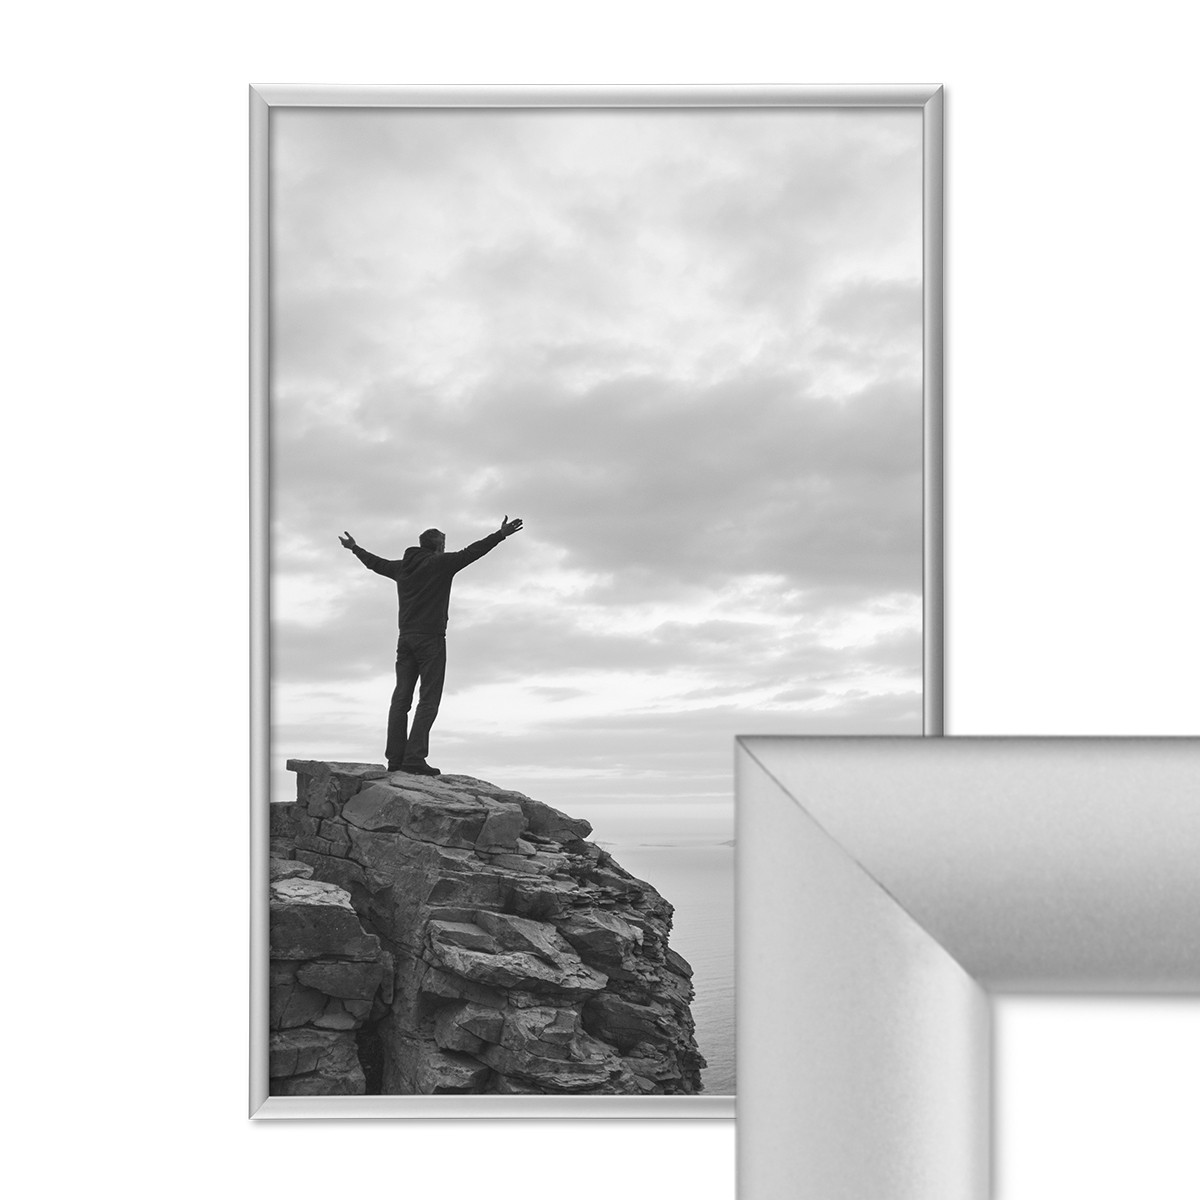 alu bilderrahmen 30x40 cm aluminium rahmen silber matt mit glasscheibe inkl zubeh r rahmen gr e. Black Bedroom Furniture Sets. Home Design Ideas